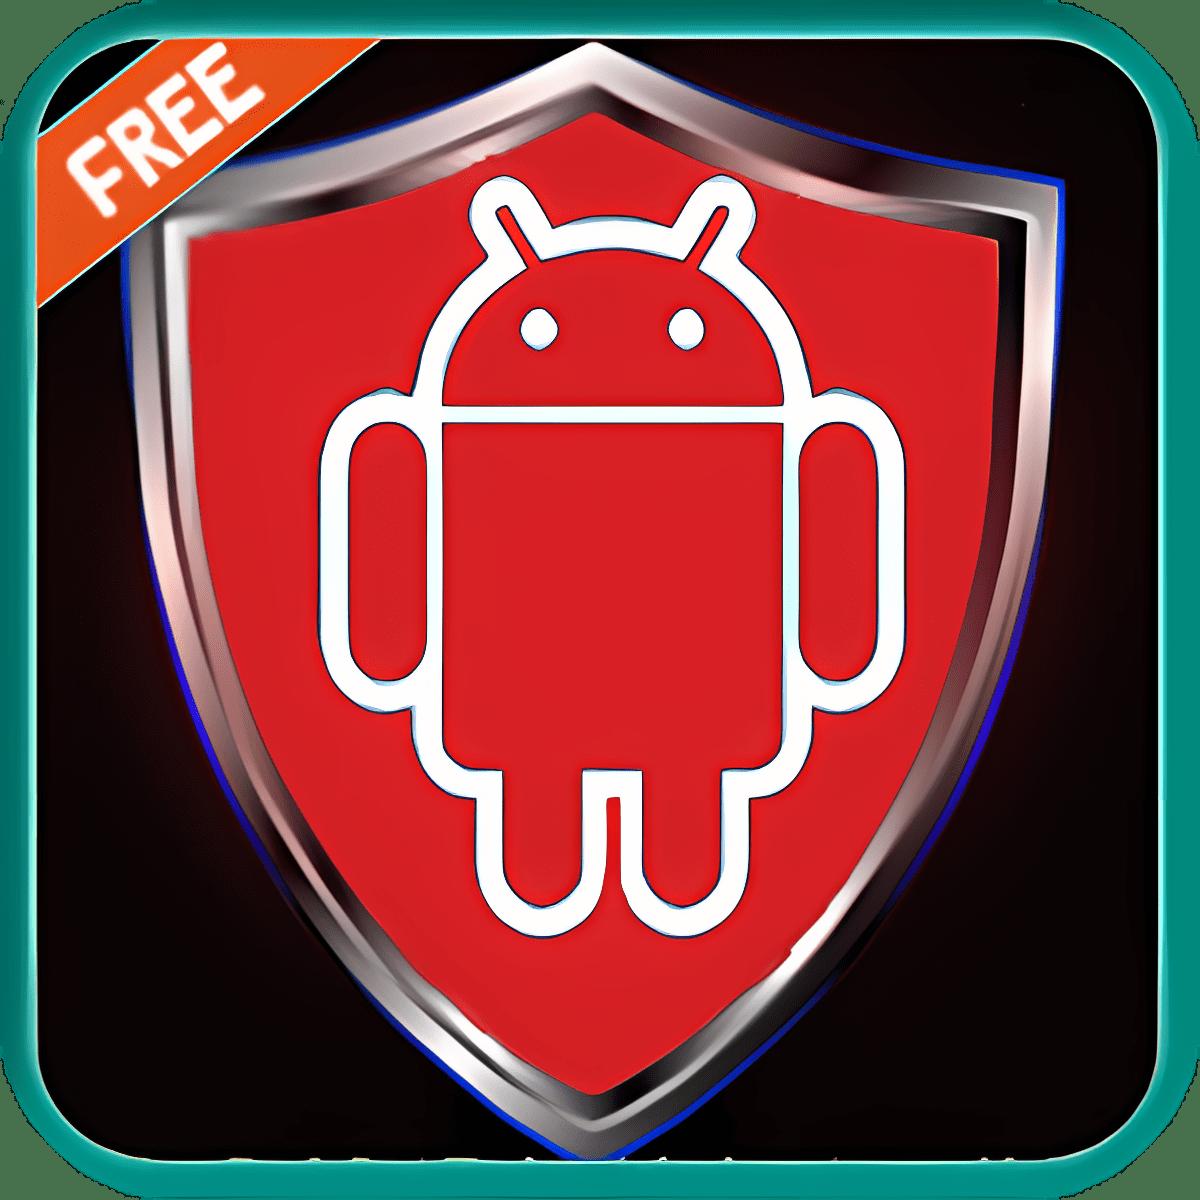 Virus Removal and Anti Malware 1.0.0